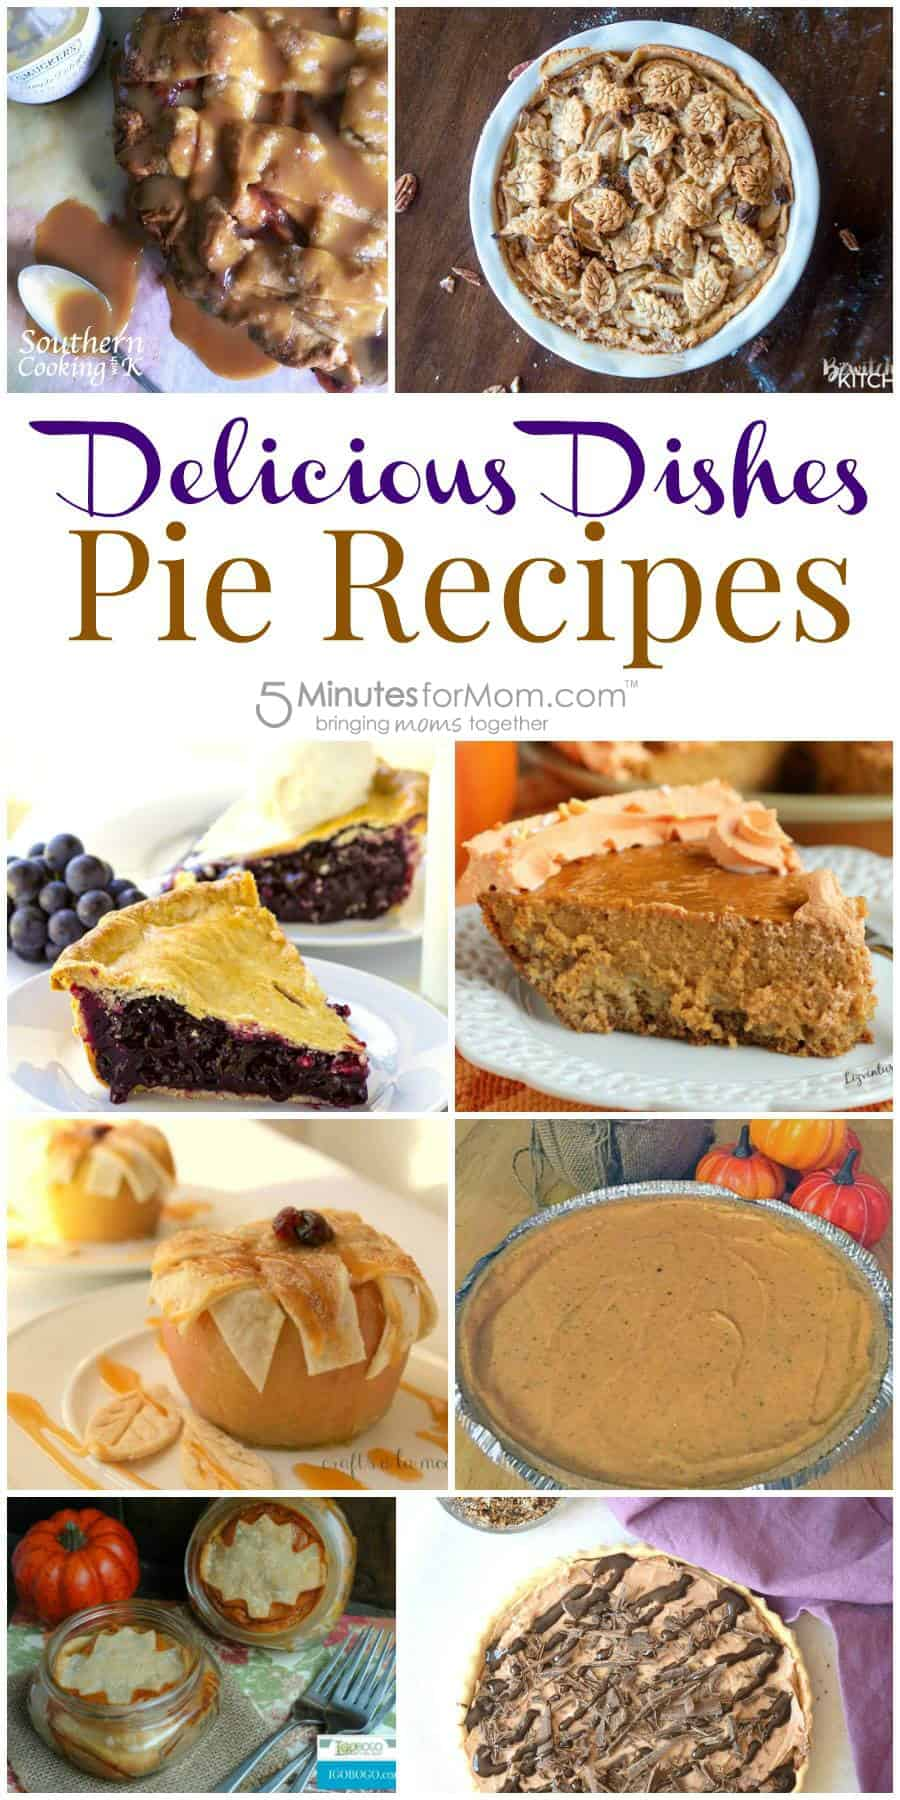 Favorite pie recipes